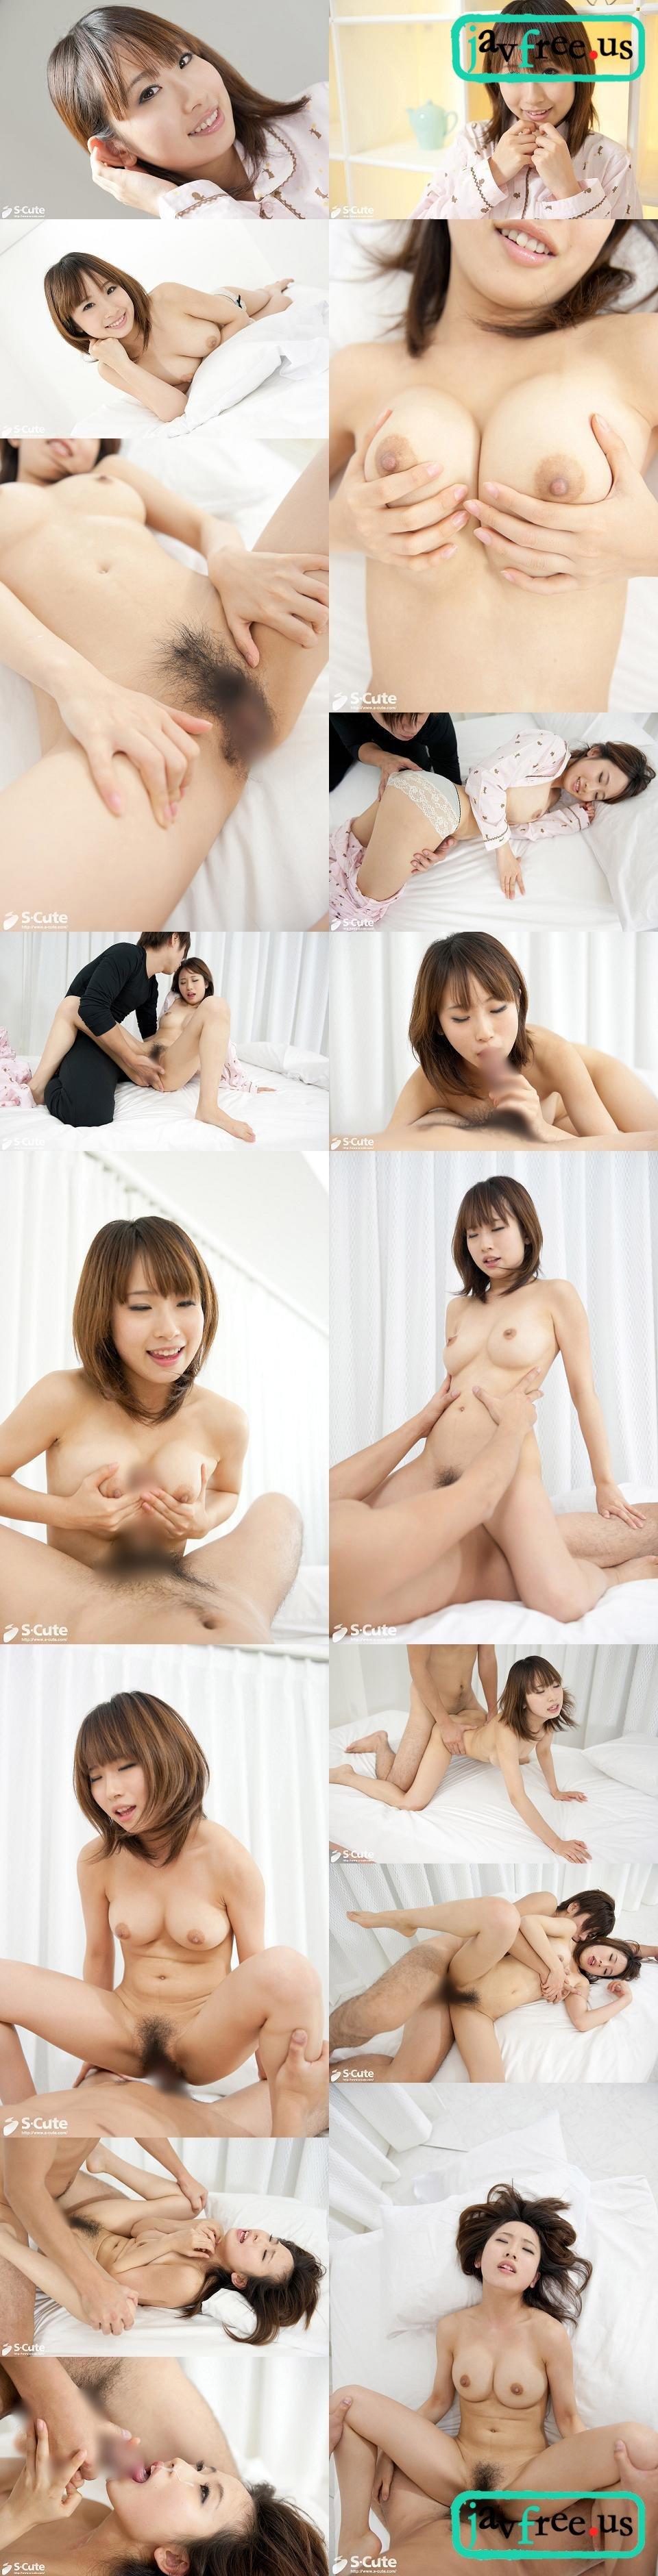 S Cute 221 Yui #4 21才 YUI